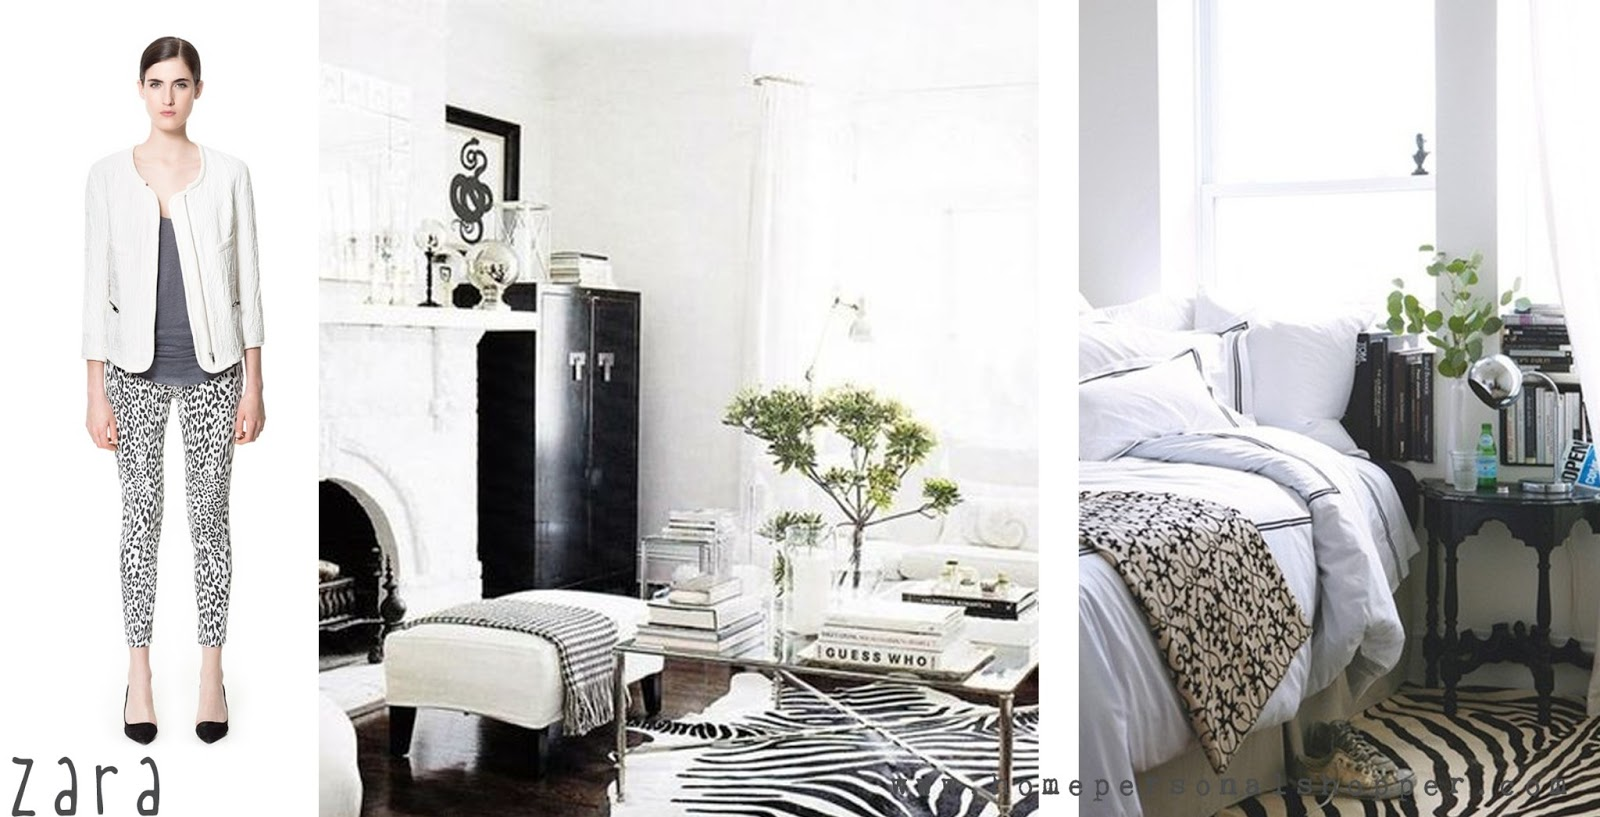 zara, vestir, moda, ropa, tendencias, homepersonalshopper, blanco, rayas, amarillo, print, zebra